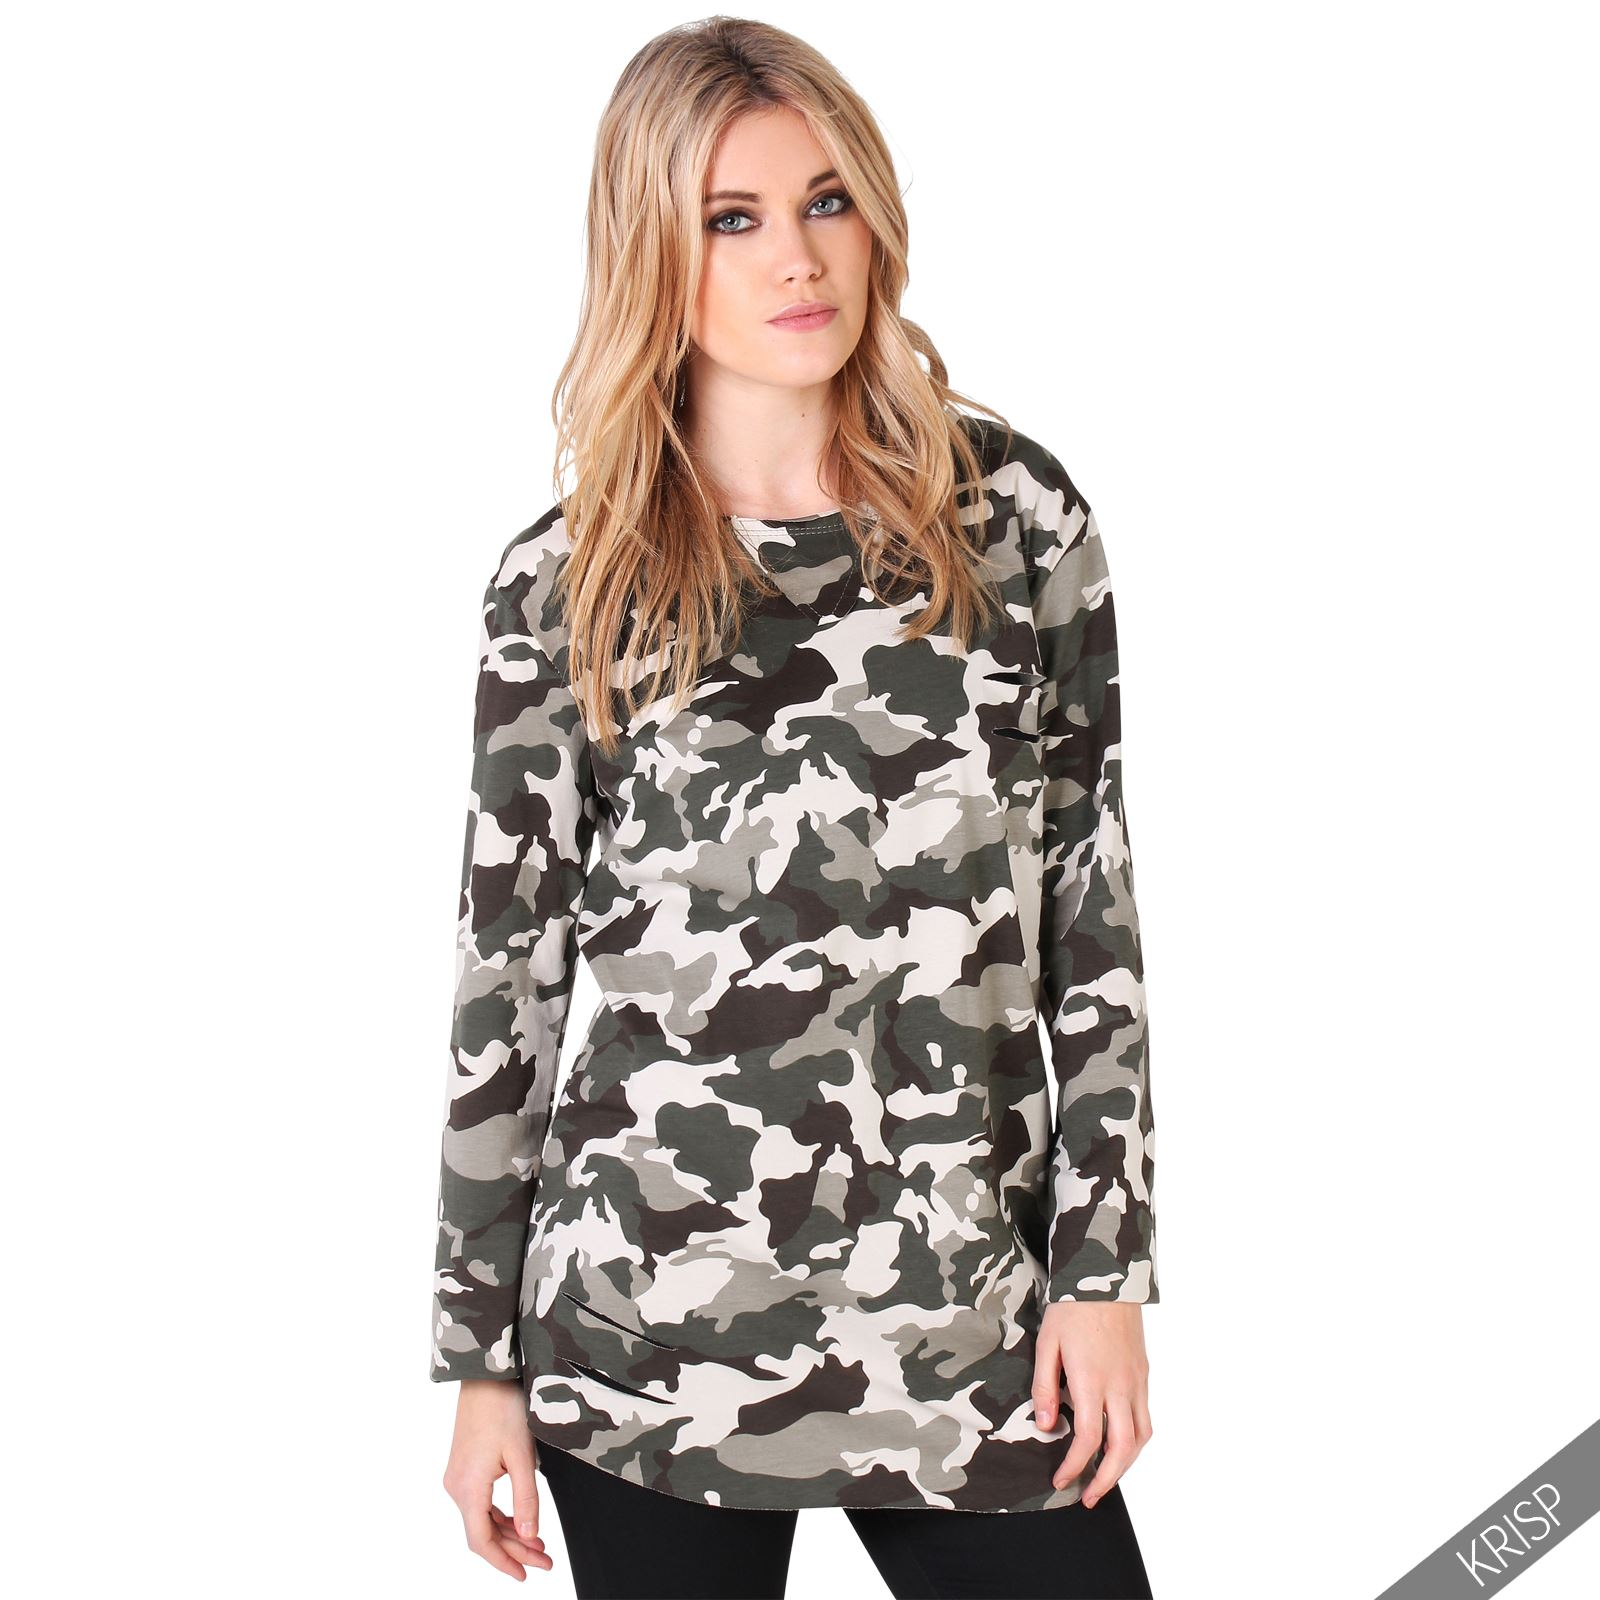 damen camouflage langarm shirt sweatshirt used style army oversize baumwolle ebay. Black Bedroom Furniture Sets. Home Design Ideas